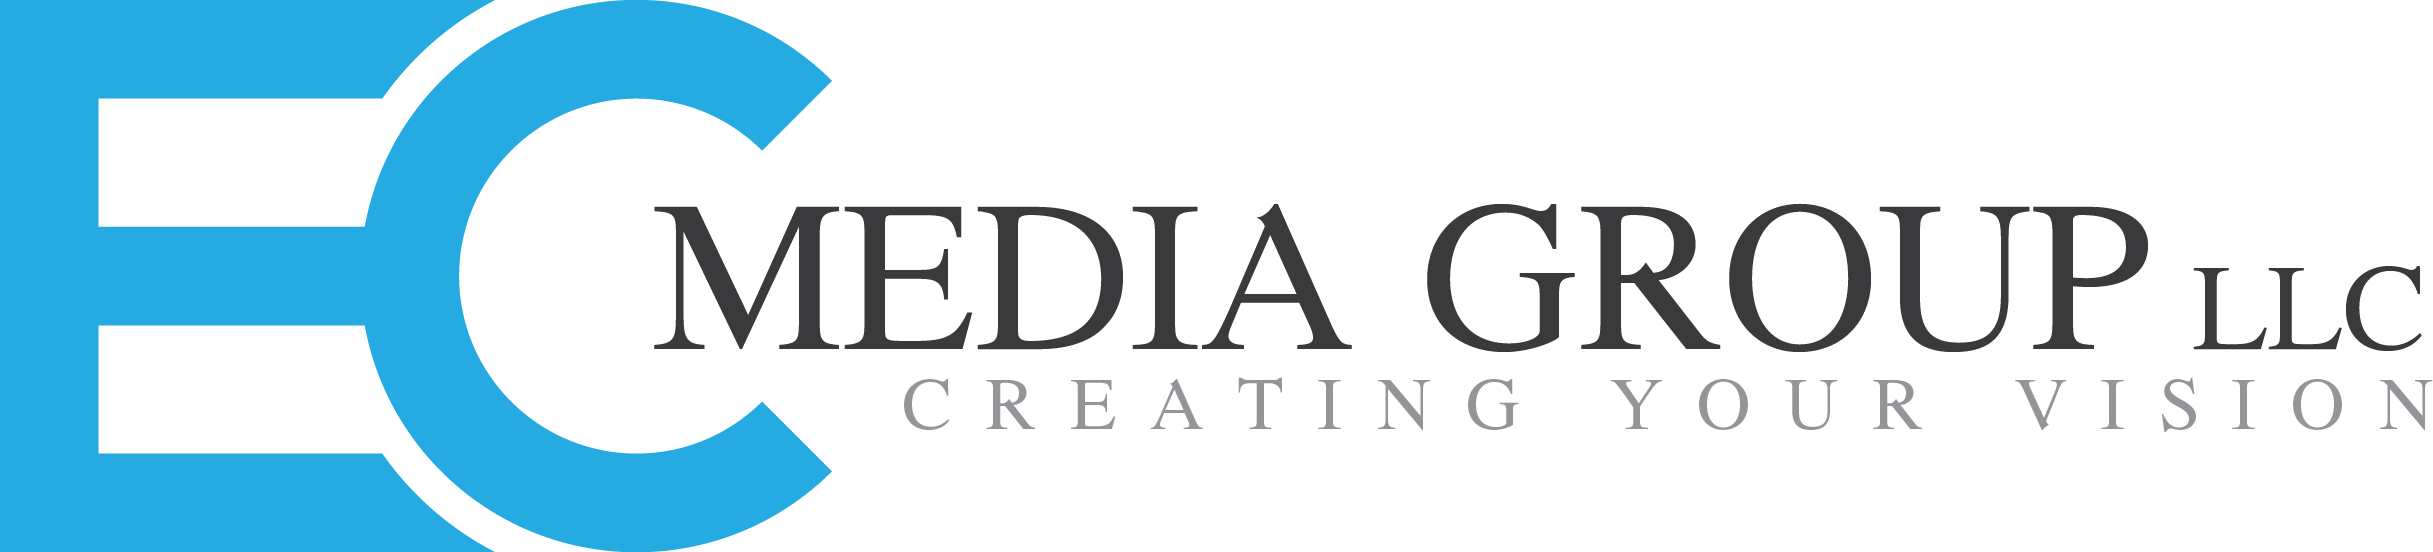 EC Media Group